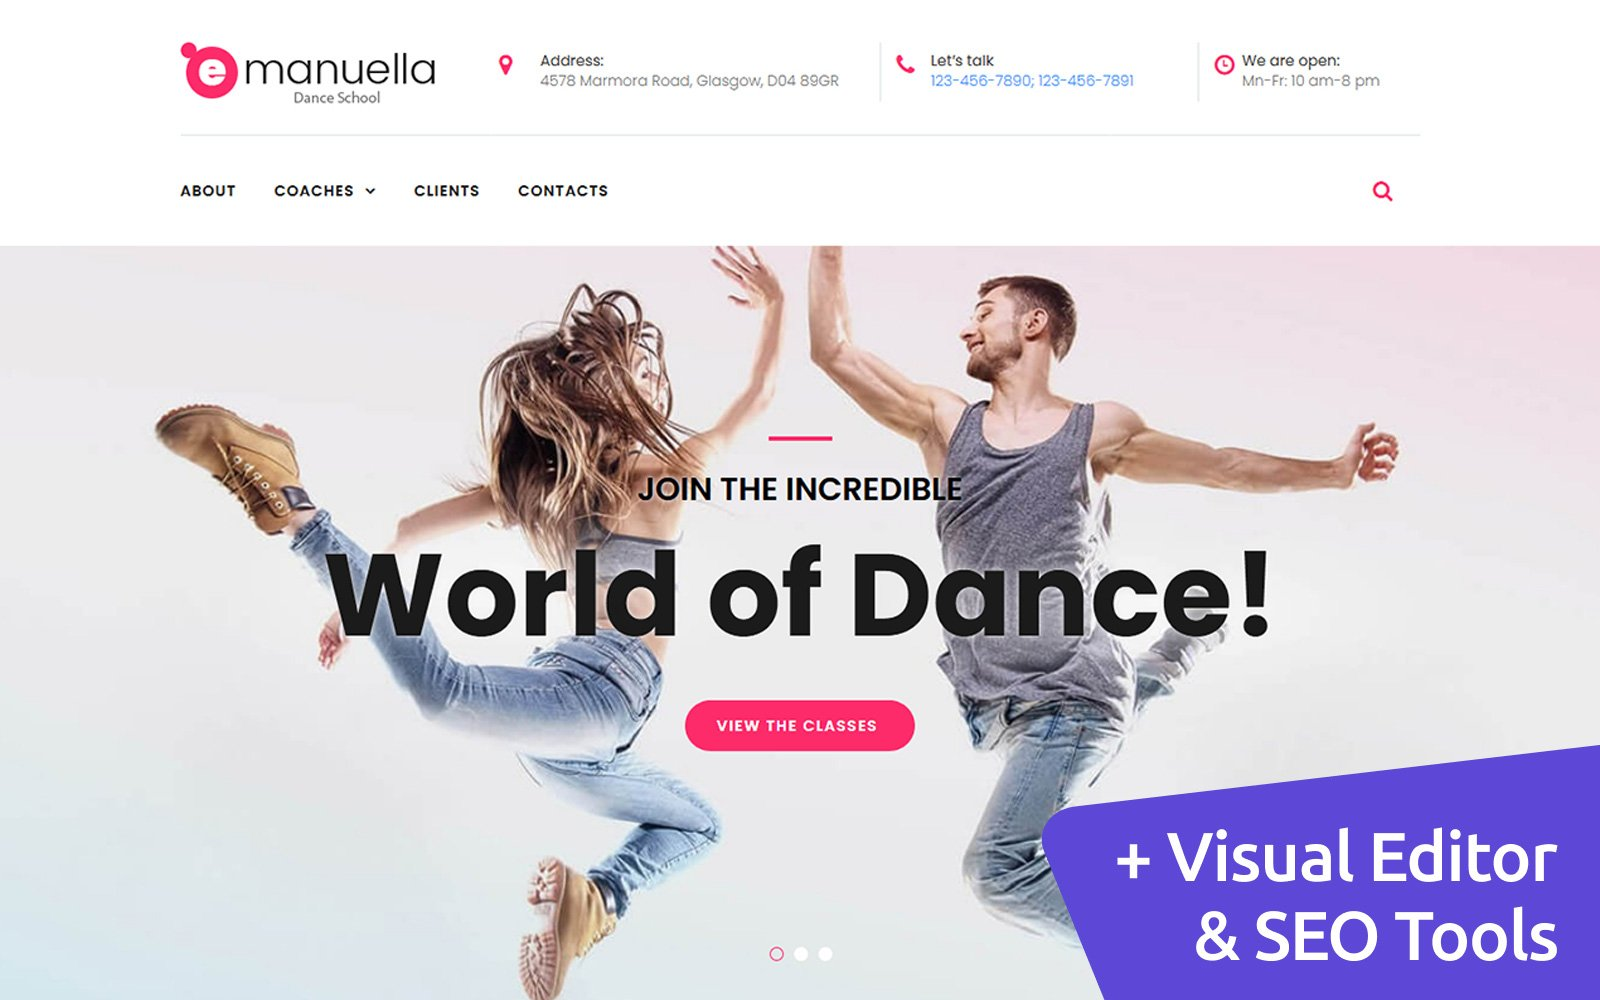 Emanuella - Dance School Moto CMS 3 Template